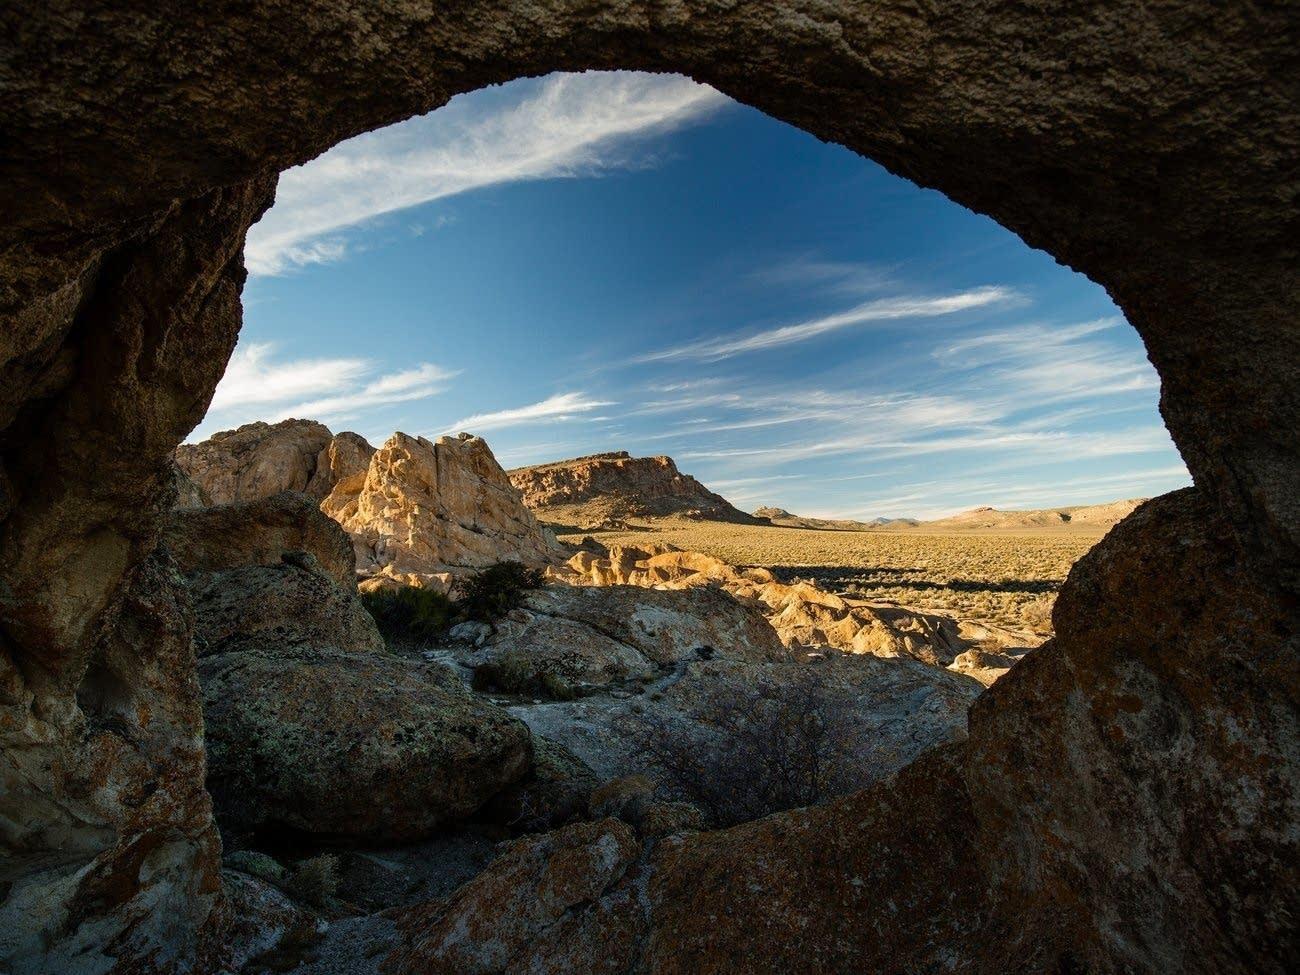 Basin and Range National Monument